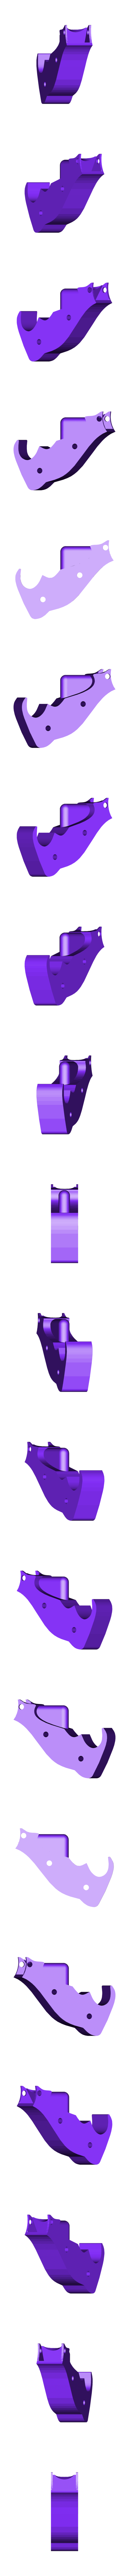 batman grappistool hand.stl Download STL file grapple gun (batman) • Design to 3D print, jasperbaudoin